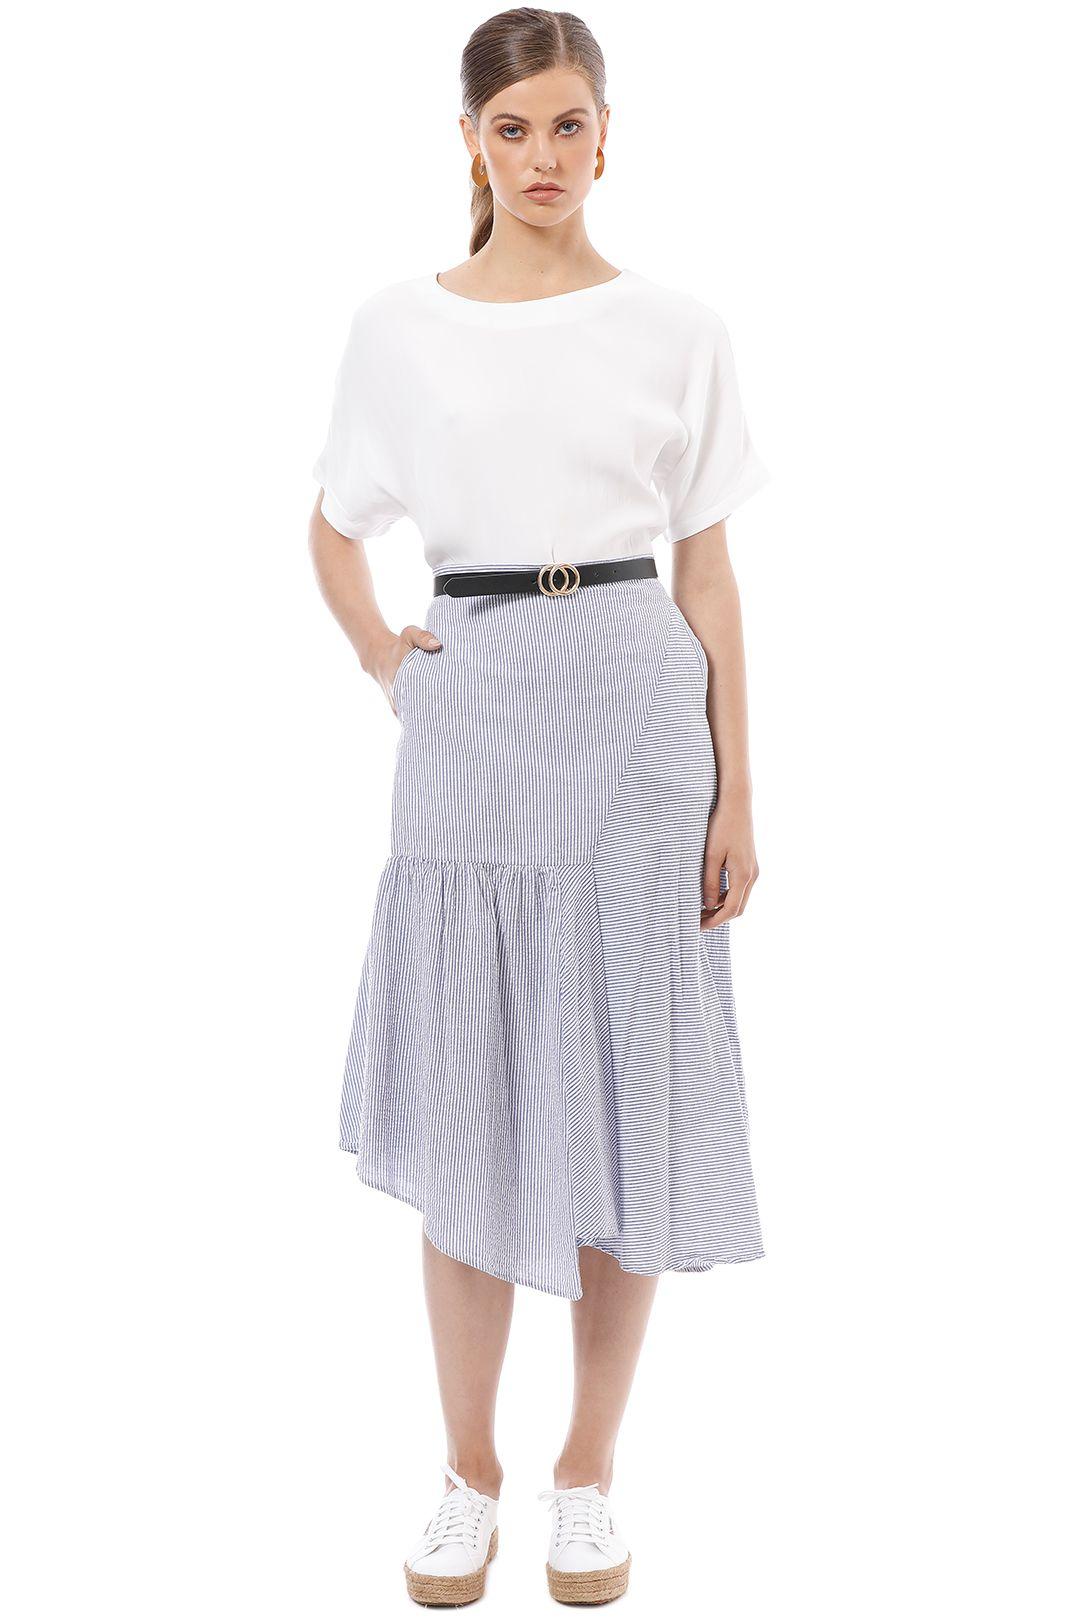 Elka Collective - Deanna Skirt - Blue - Front